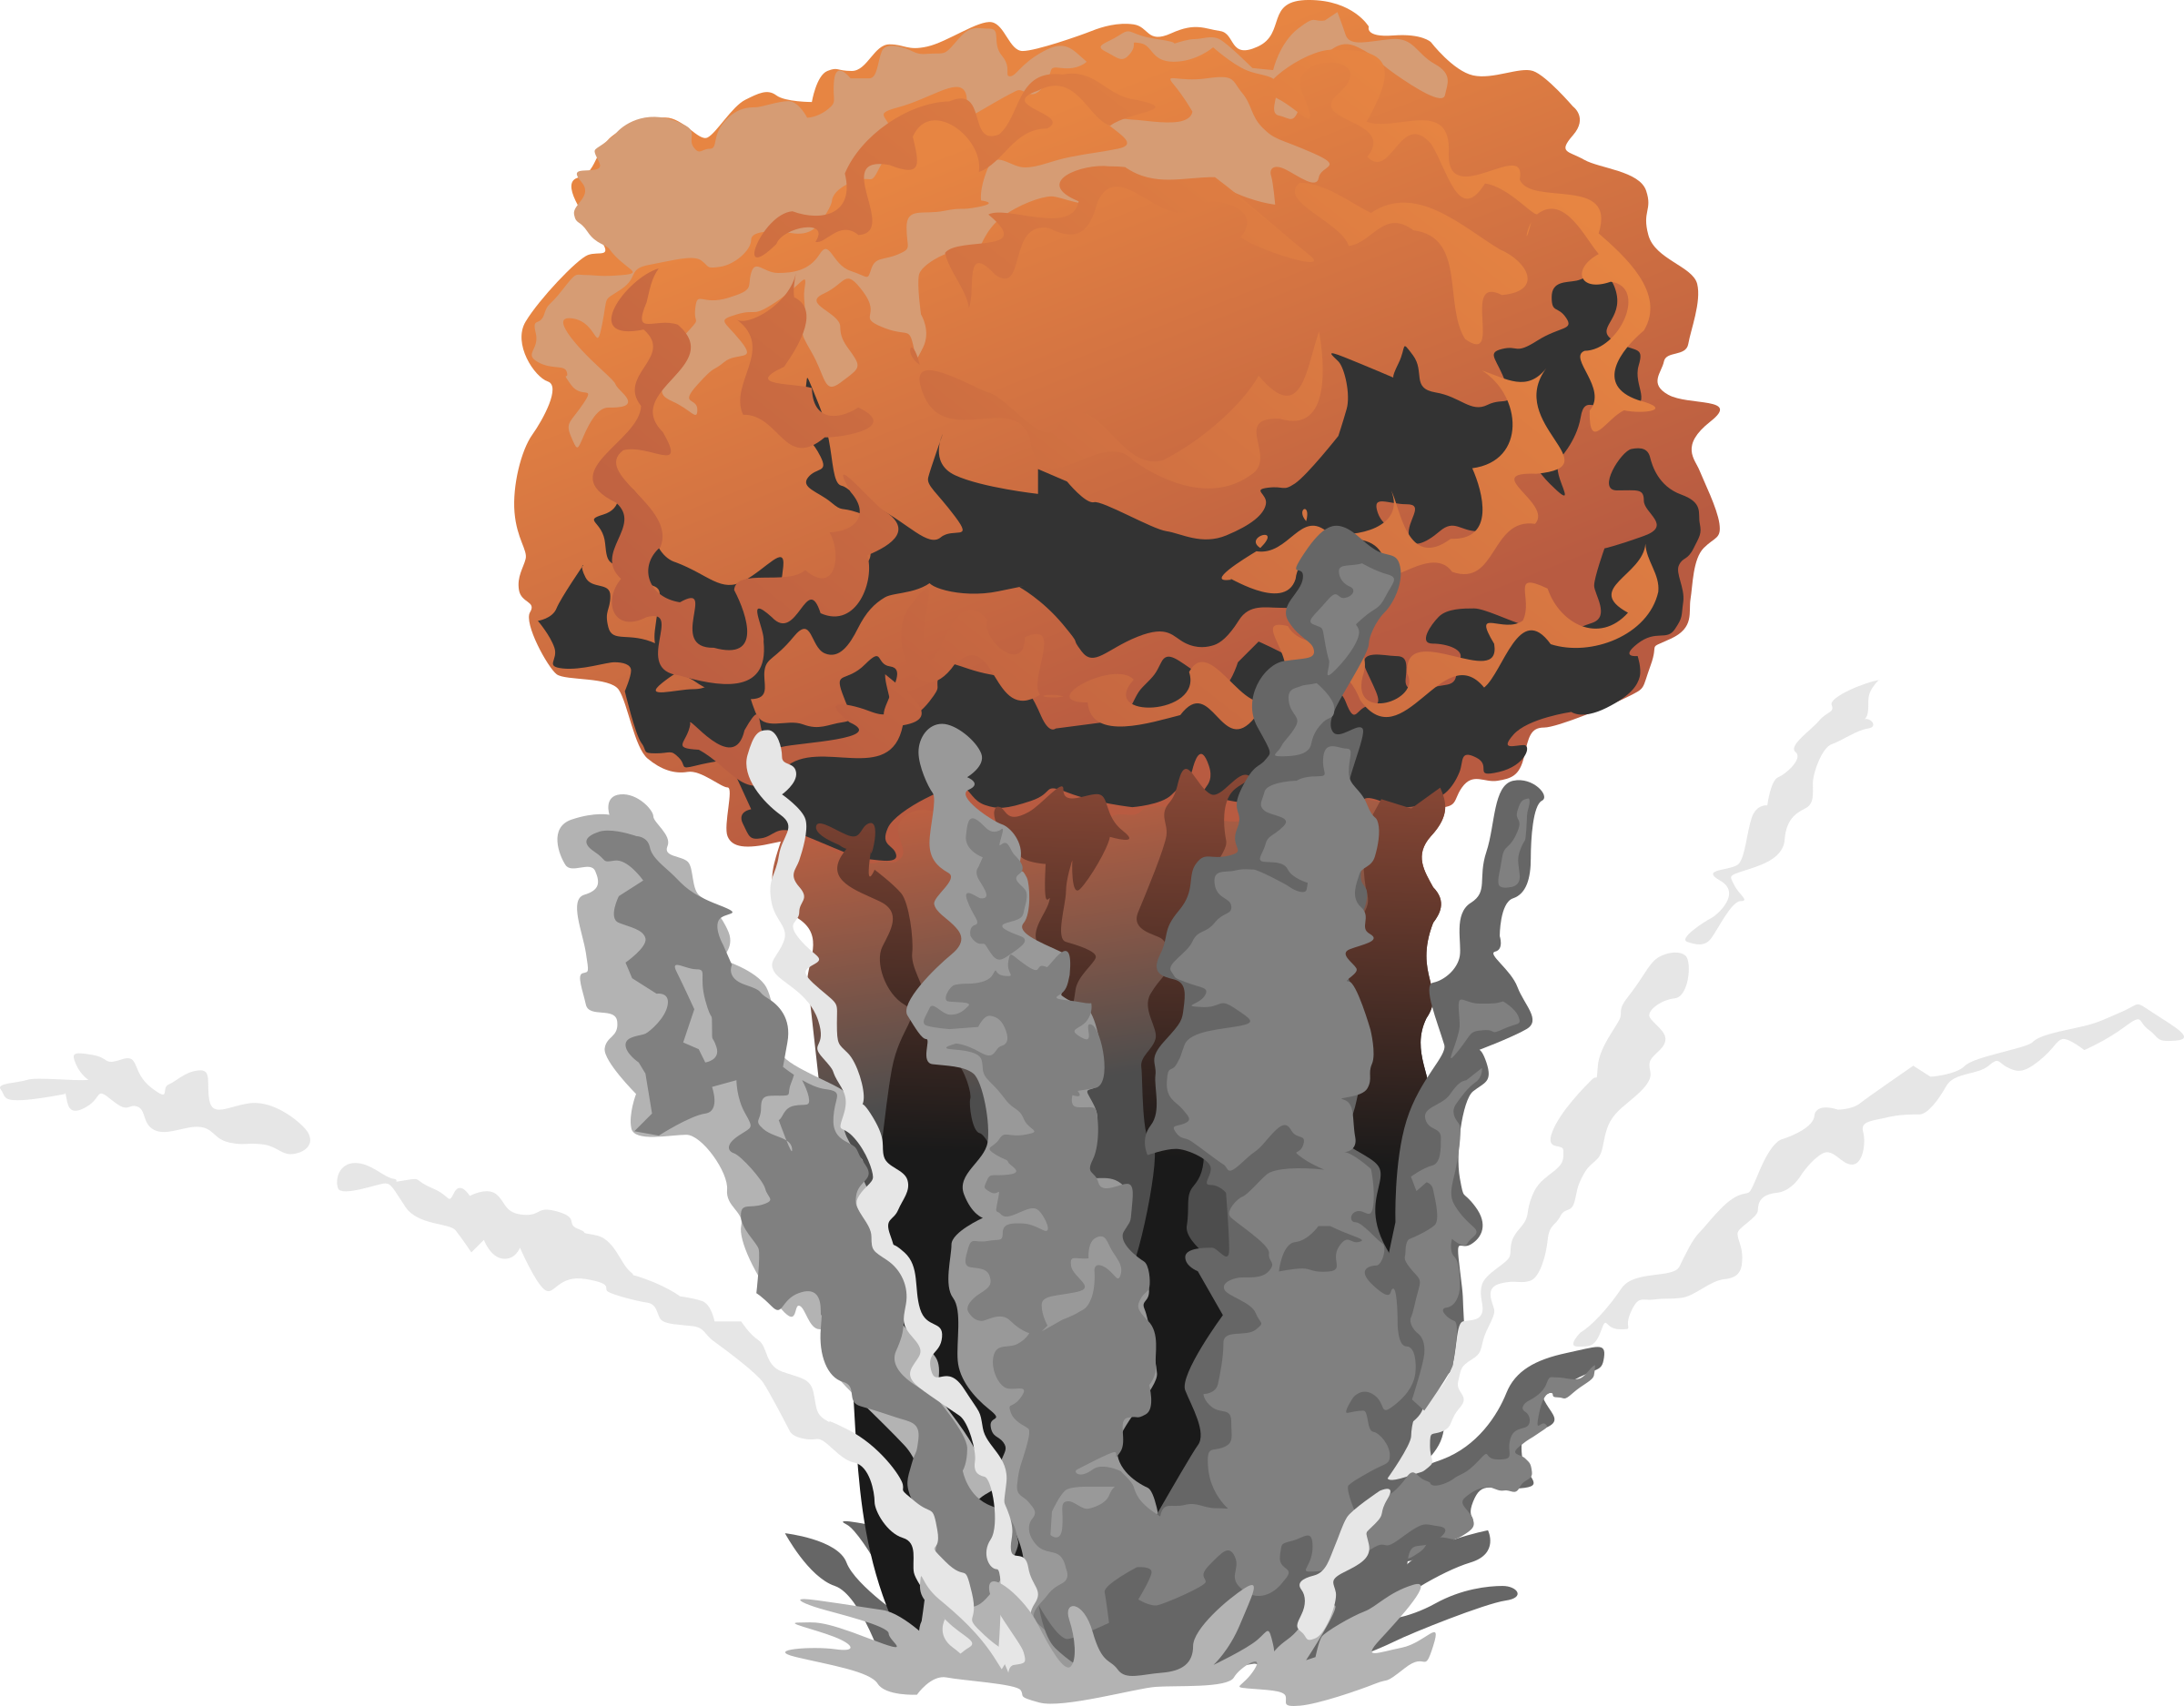 Big Explosion Png Png Image Purepng